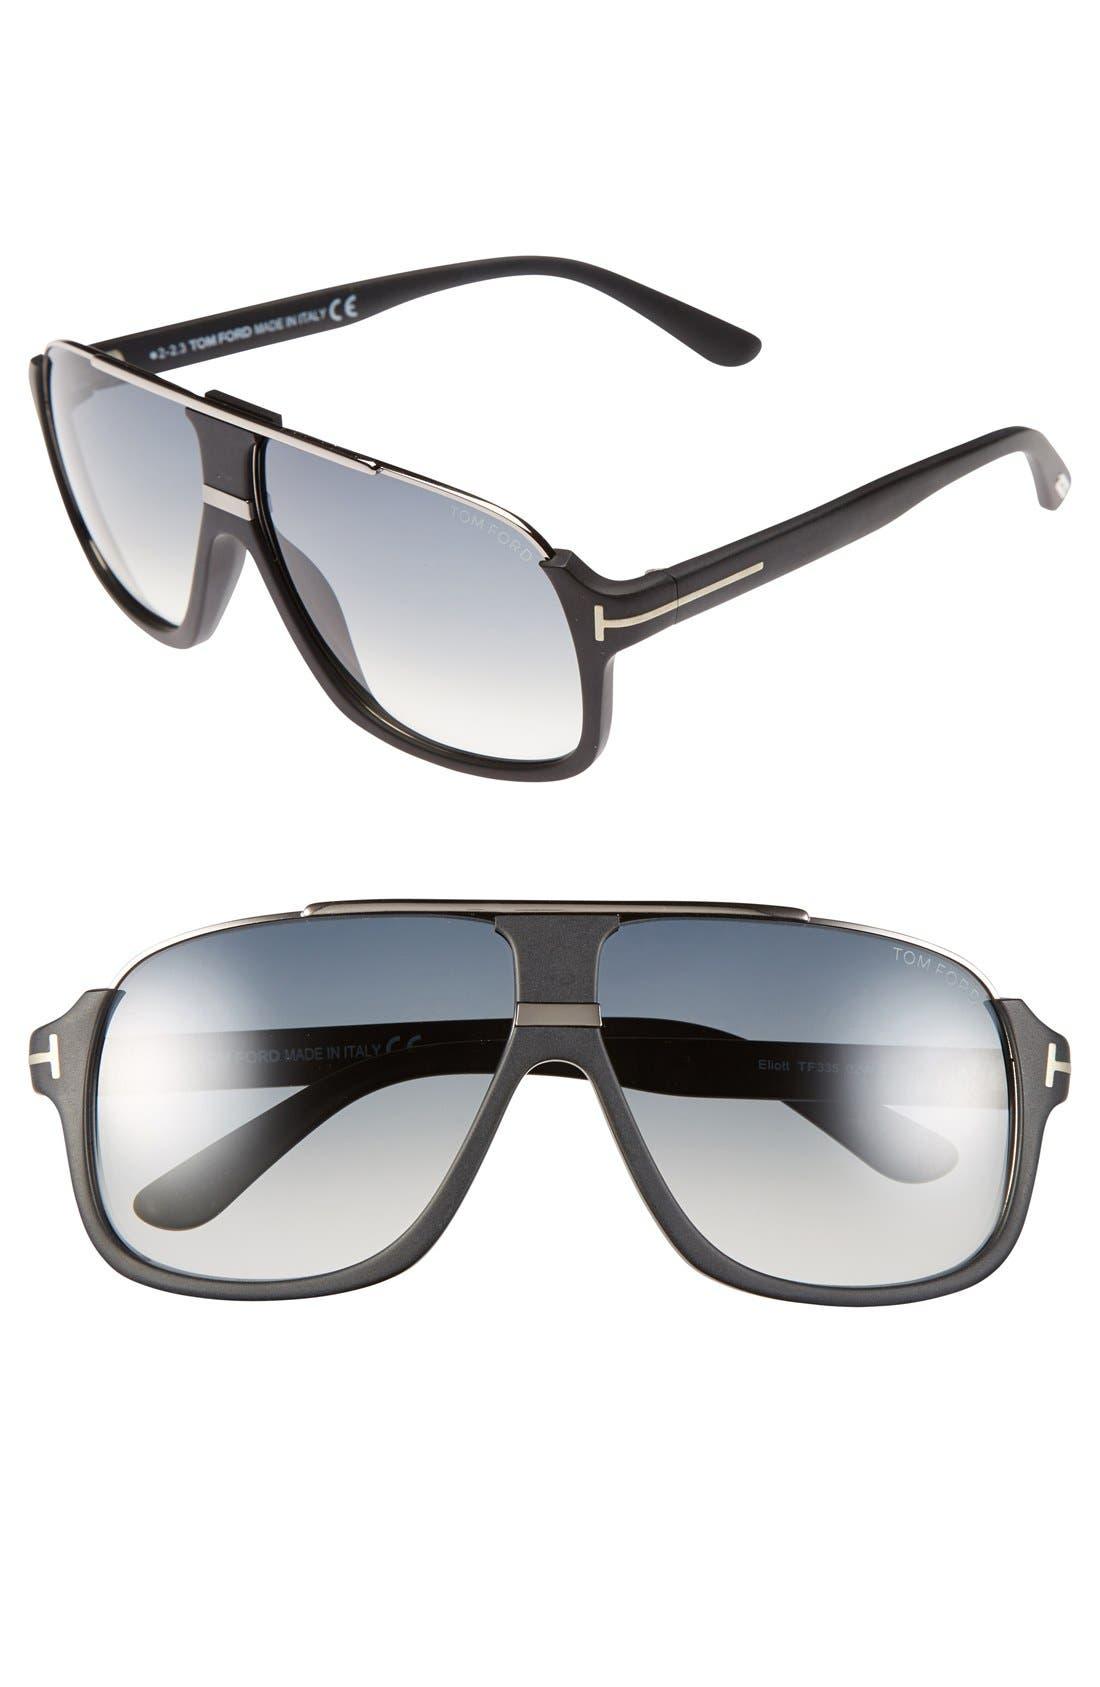 Alternate Image 1 Selected - Tom Ford 'Eliot' 60mm Sunglasses